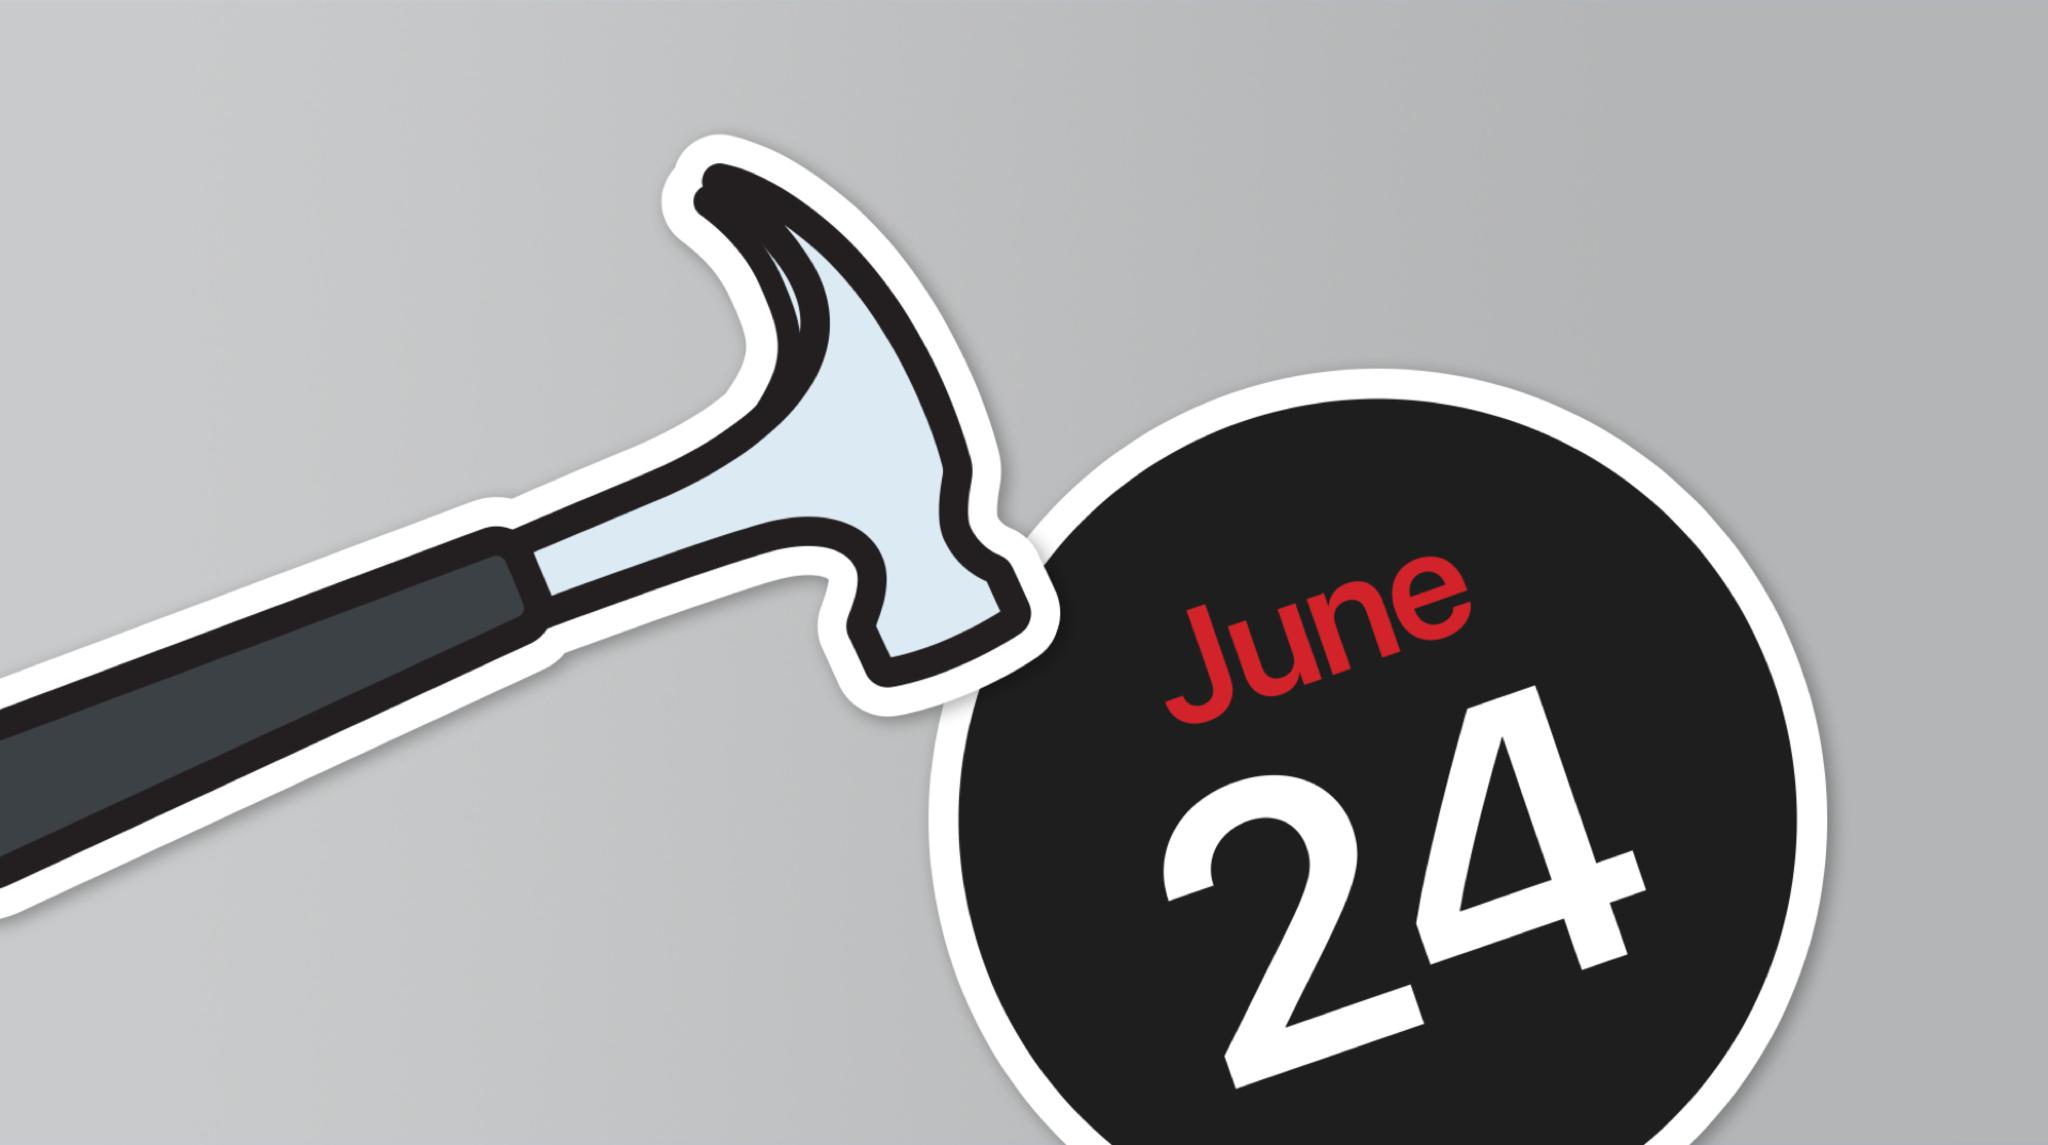 MacBook with June 24 sticker and Xcode hammer sticker